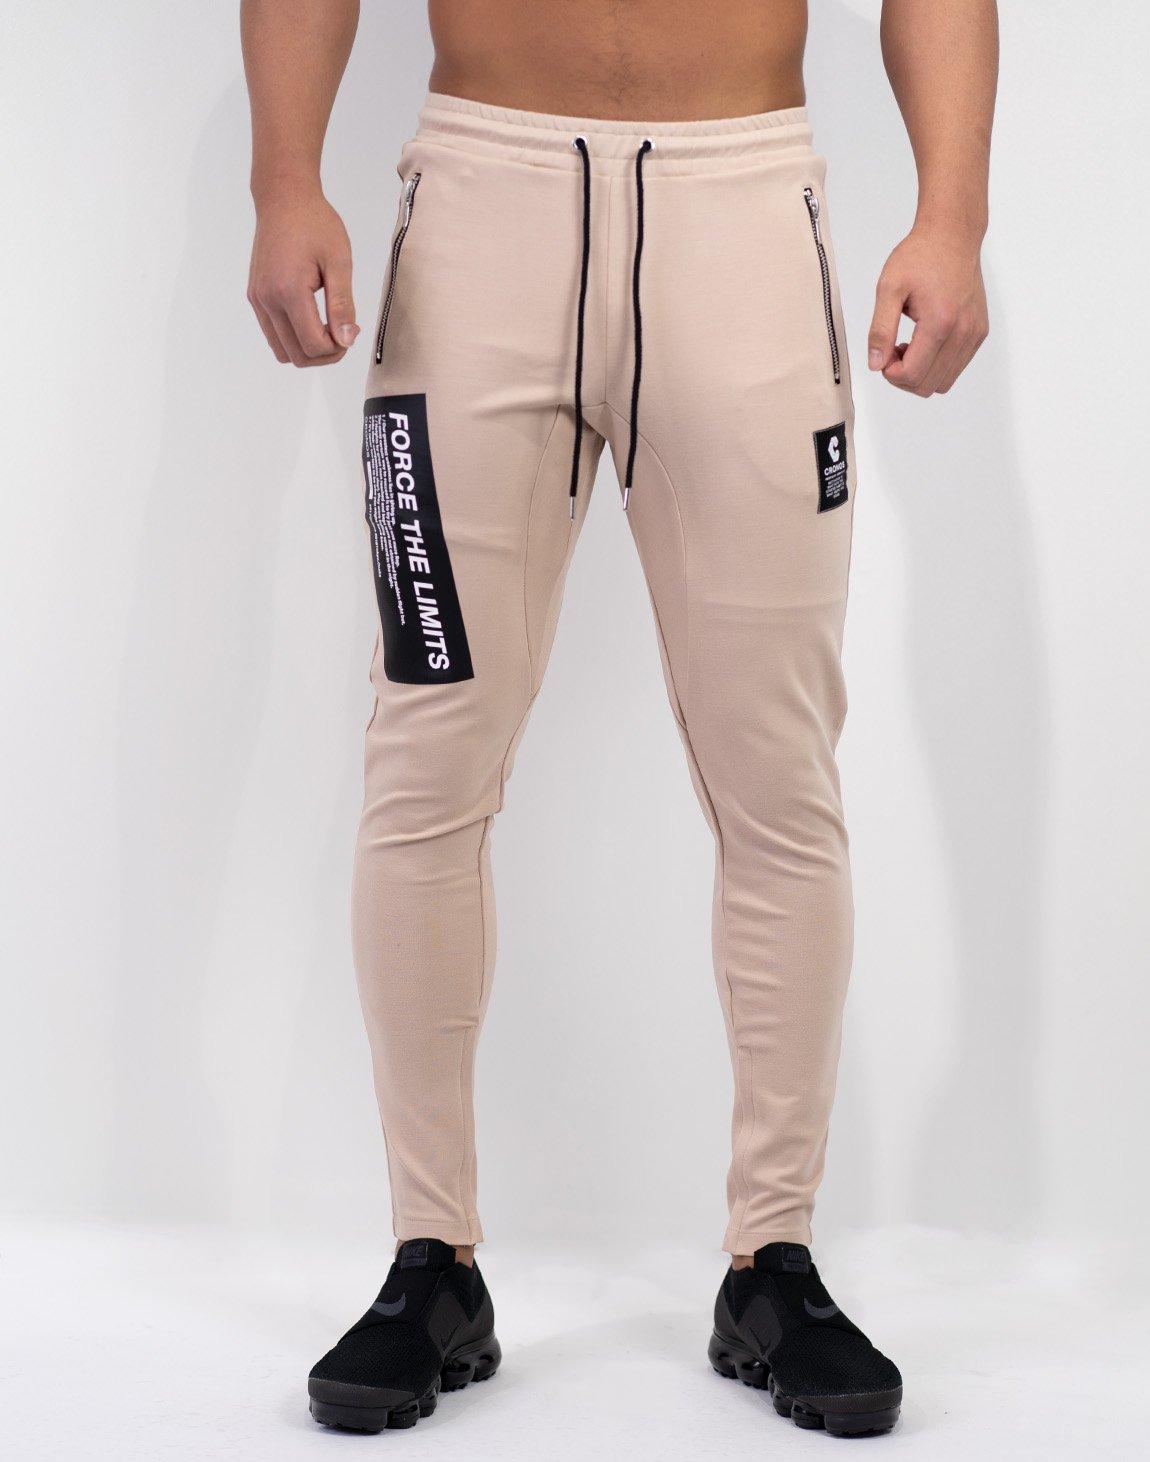 LP0012 Modo Pants BEIGE